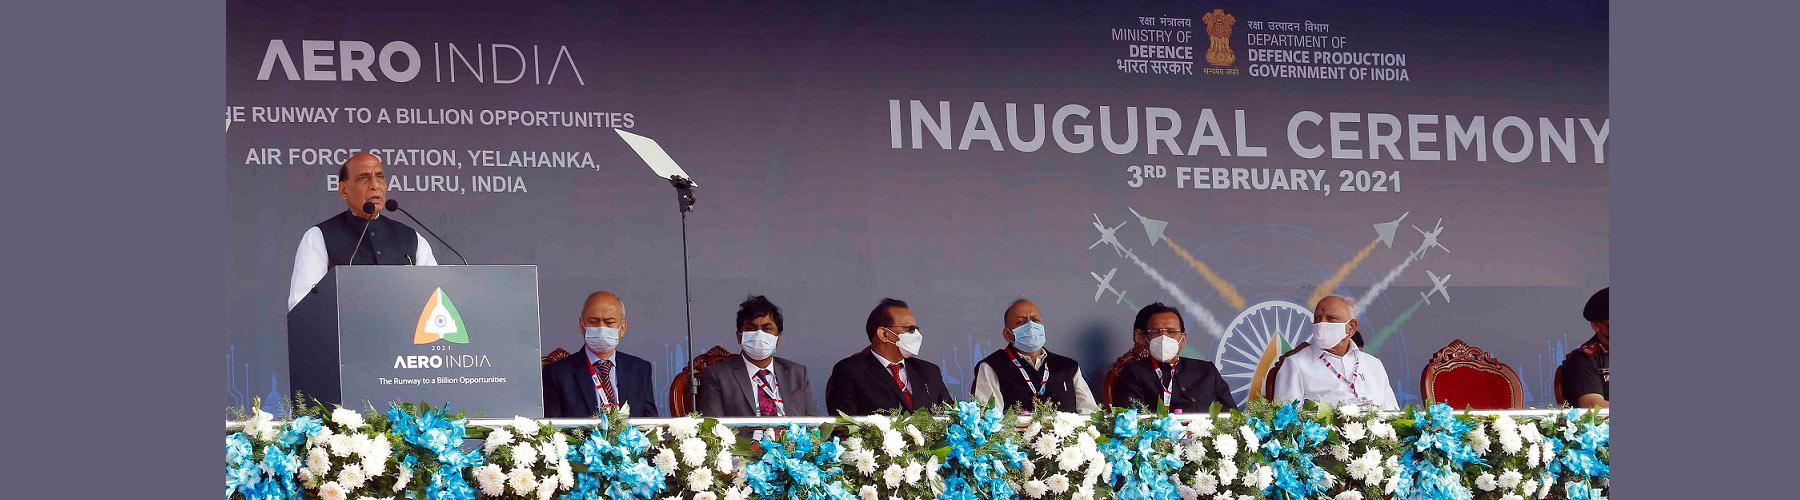 Raksha Mantri Shri Rajnath Singh addressing the biennial air show, Aero India 2021 at the Air Force Station, Yelahanka in Bengaluru on Wednesday, February 03, 2021